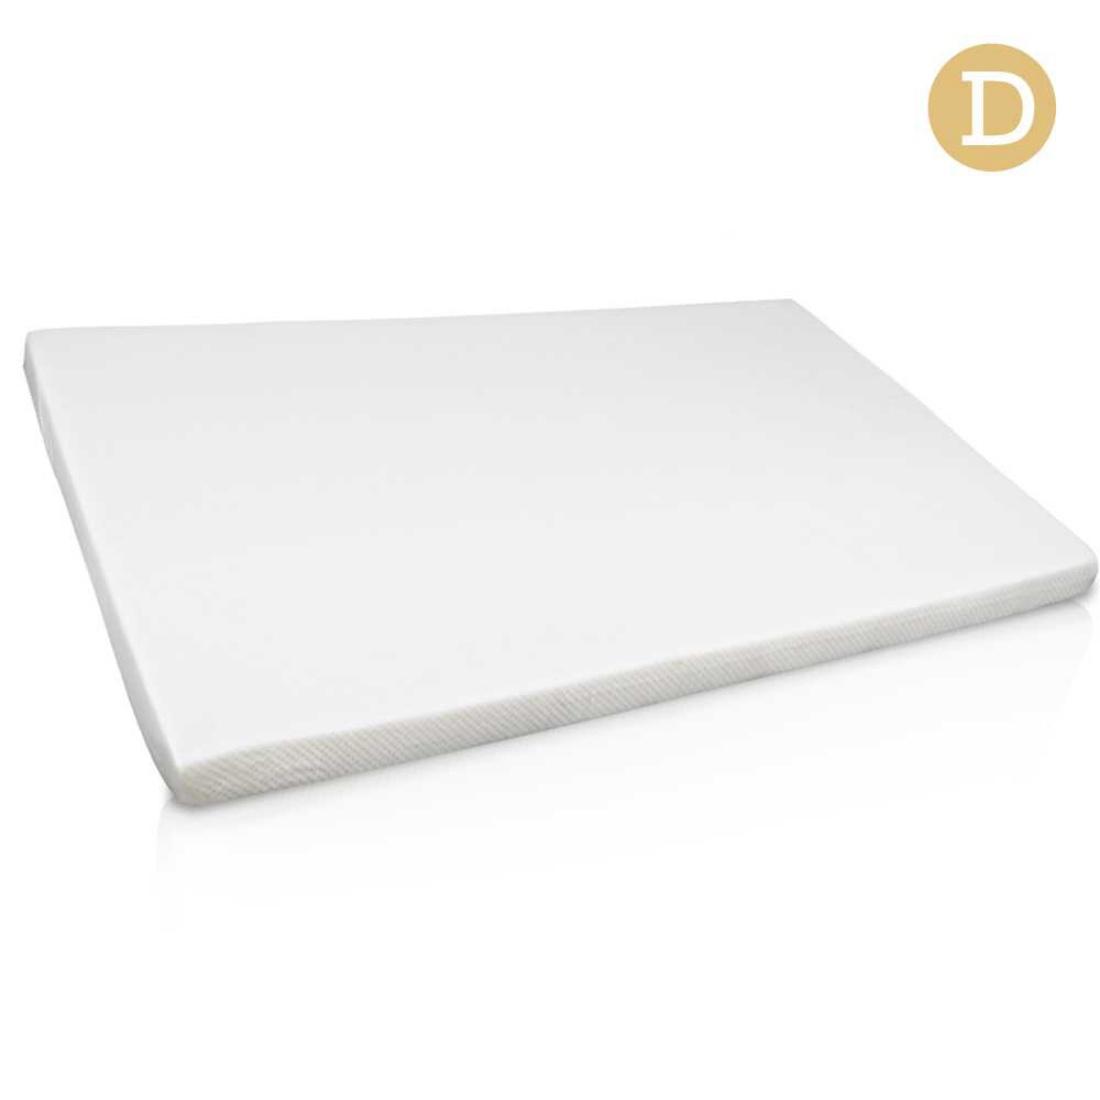 Visco Elastic Memory Foam Mattress Topper 7cm Double